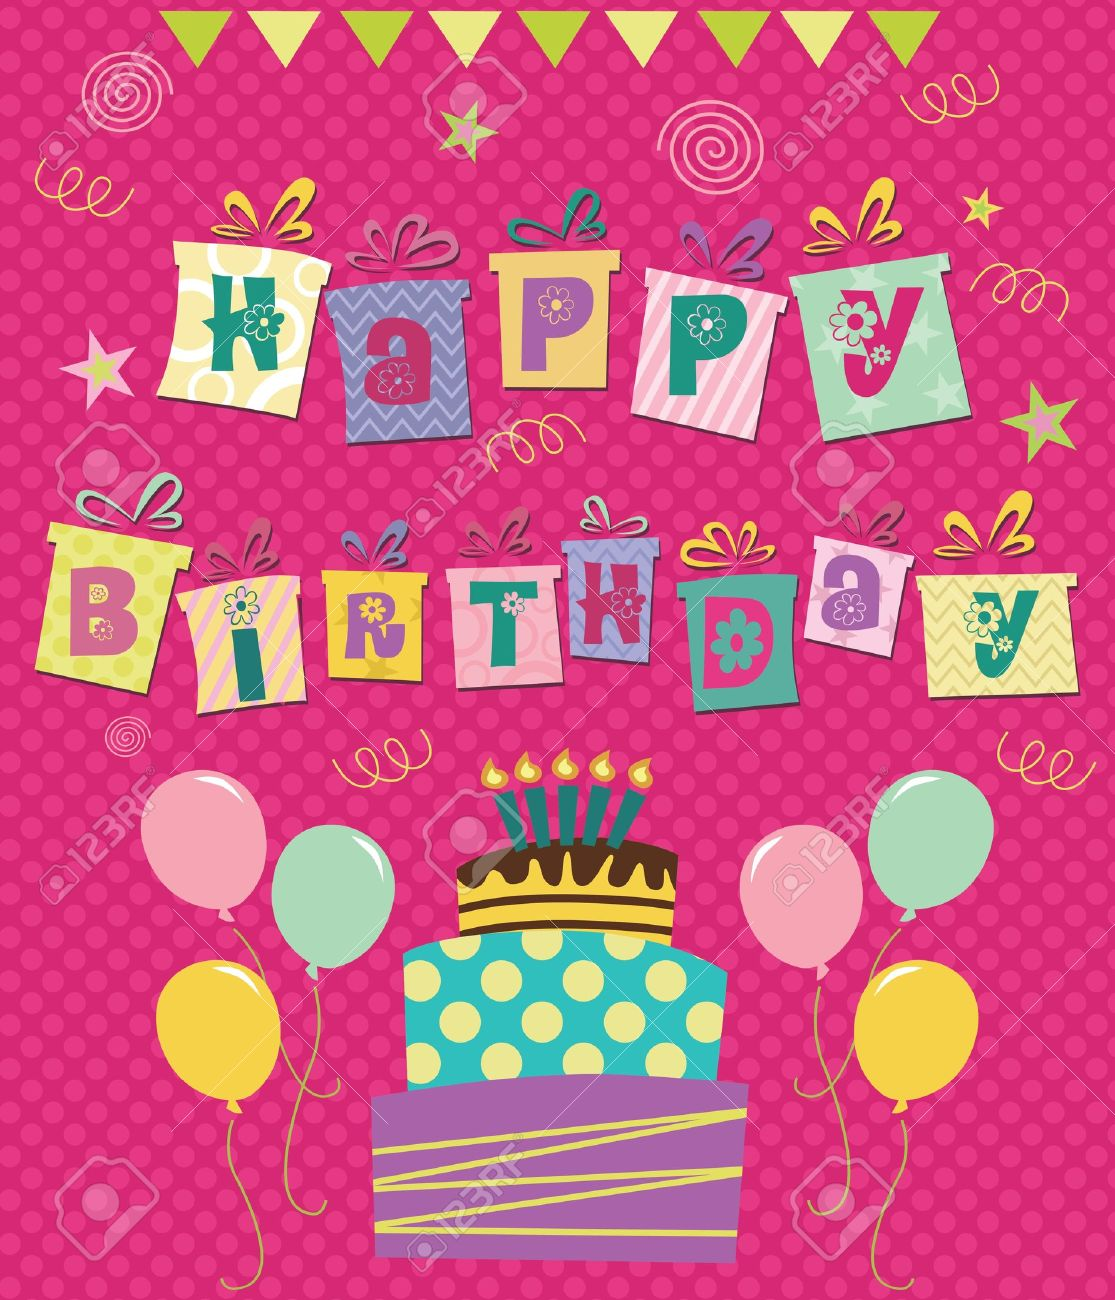 Happy birthday greeting card illustration royalty free cliparts happy birthday greeting card illustration stock vector 20855084 m4hsunfo